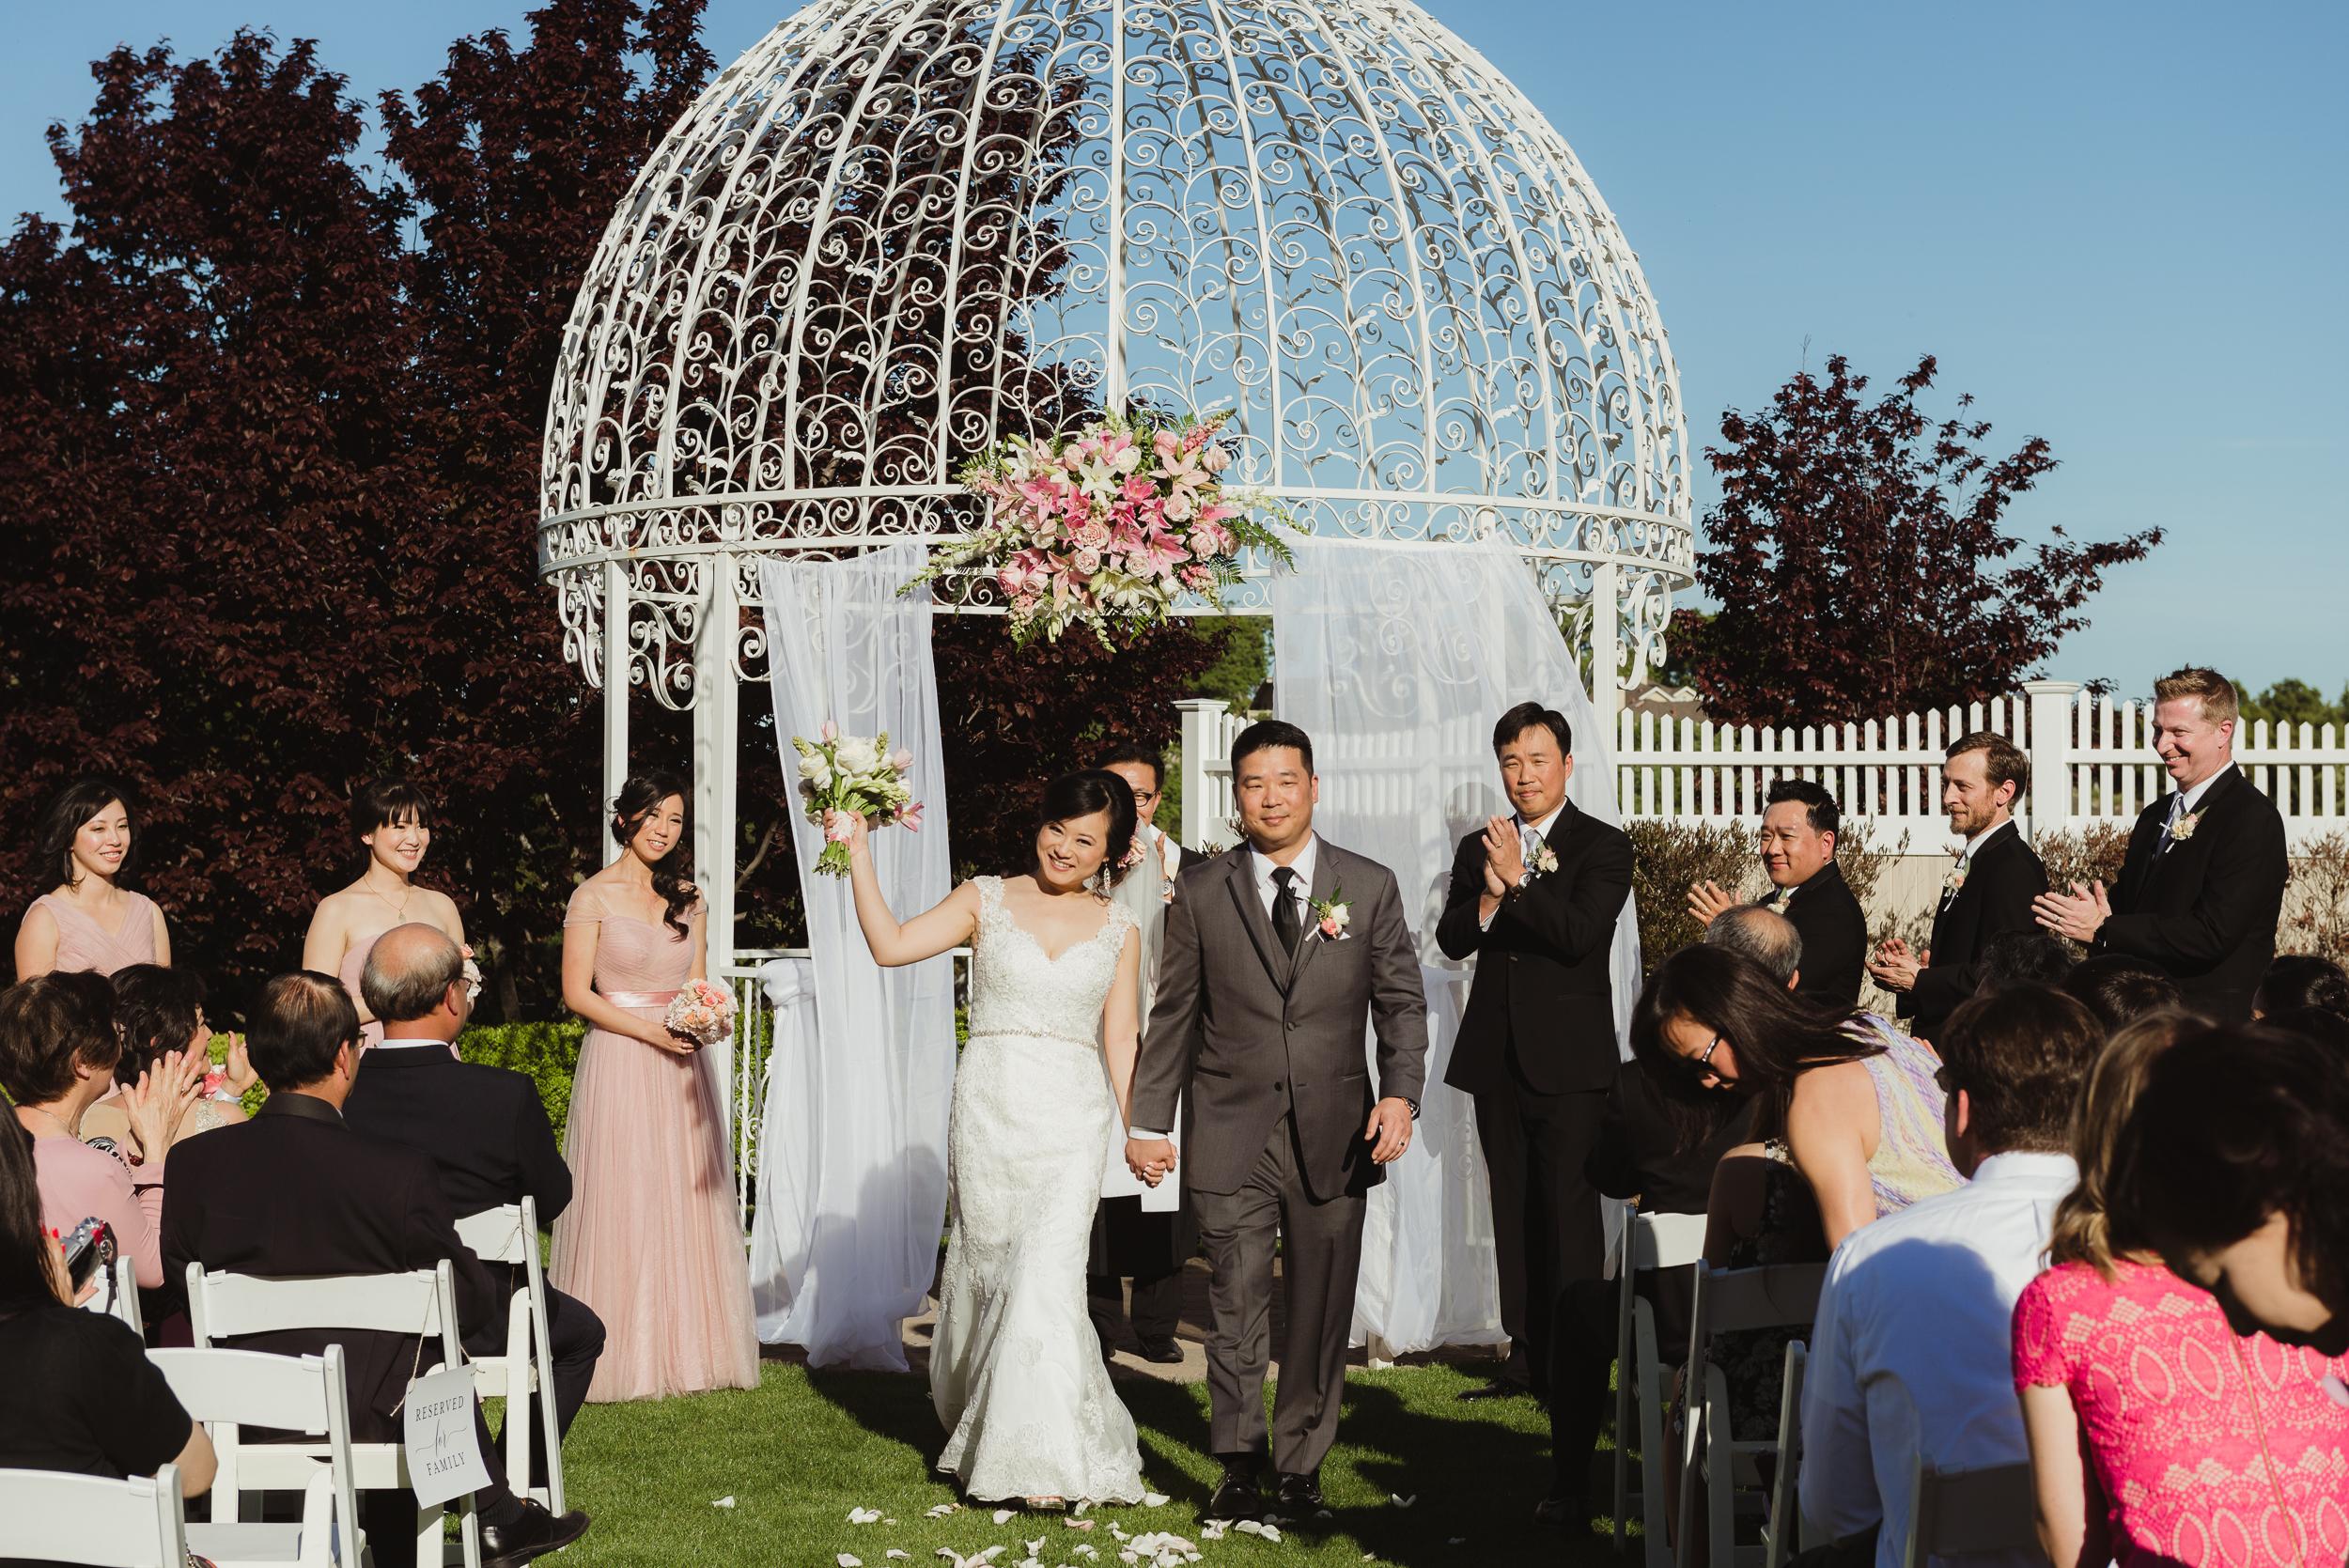 21-saratoga-country-club-wedding-vivianchen-286.jpg